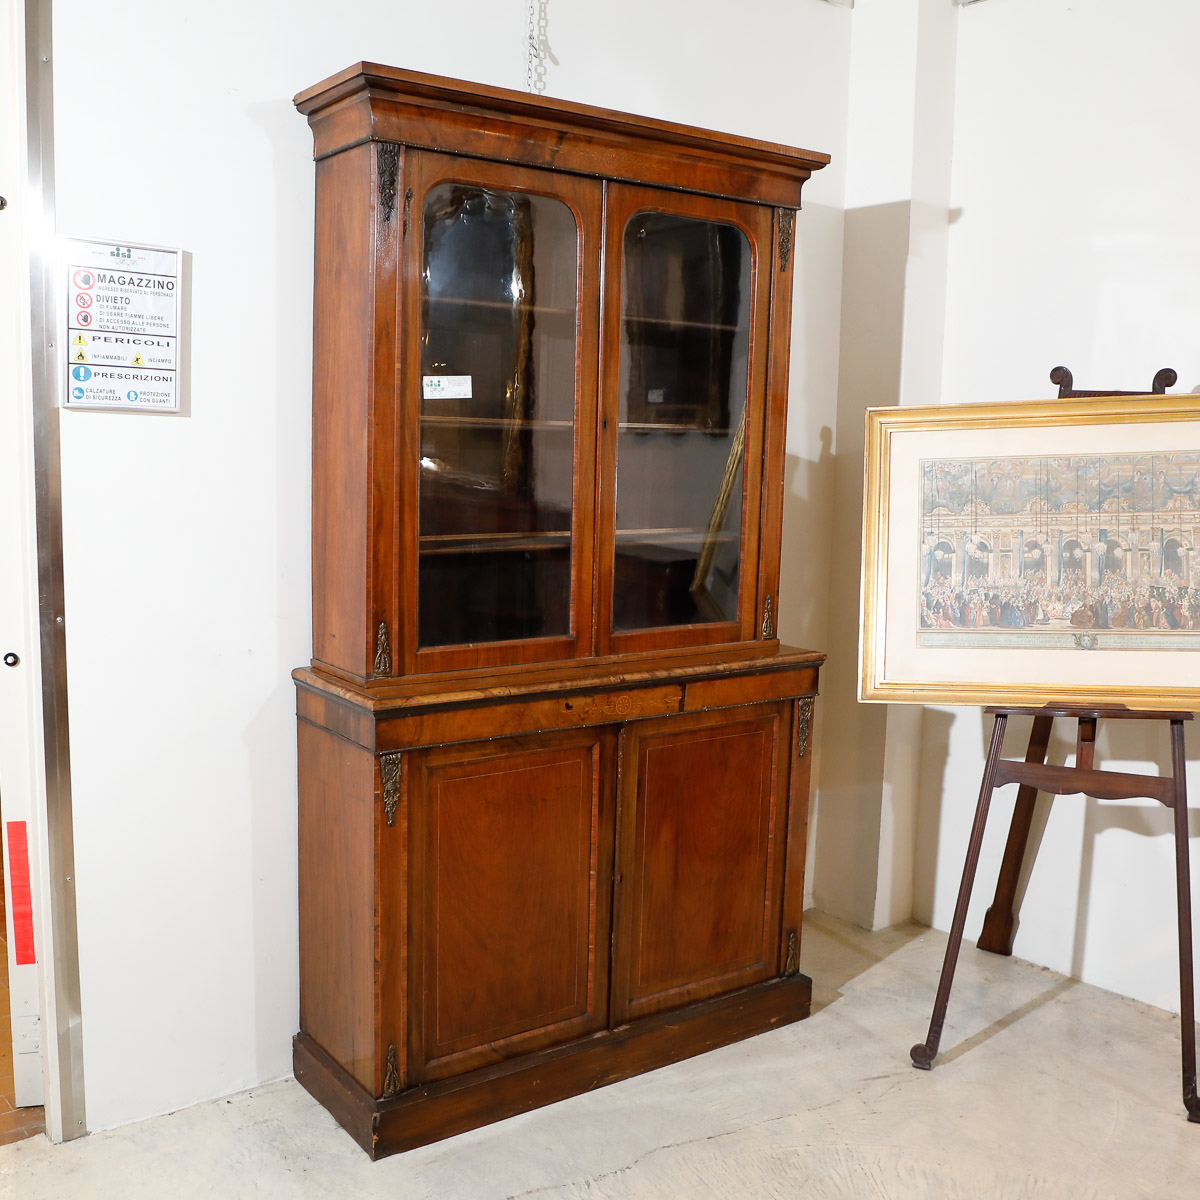 libreria vetrina fine 800 inglese mobili sisi antiquariato